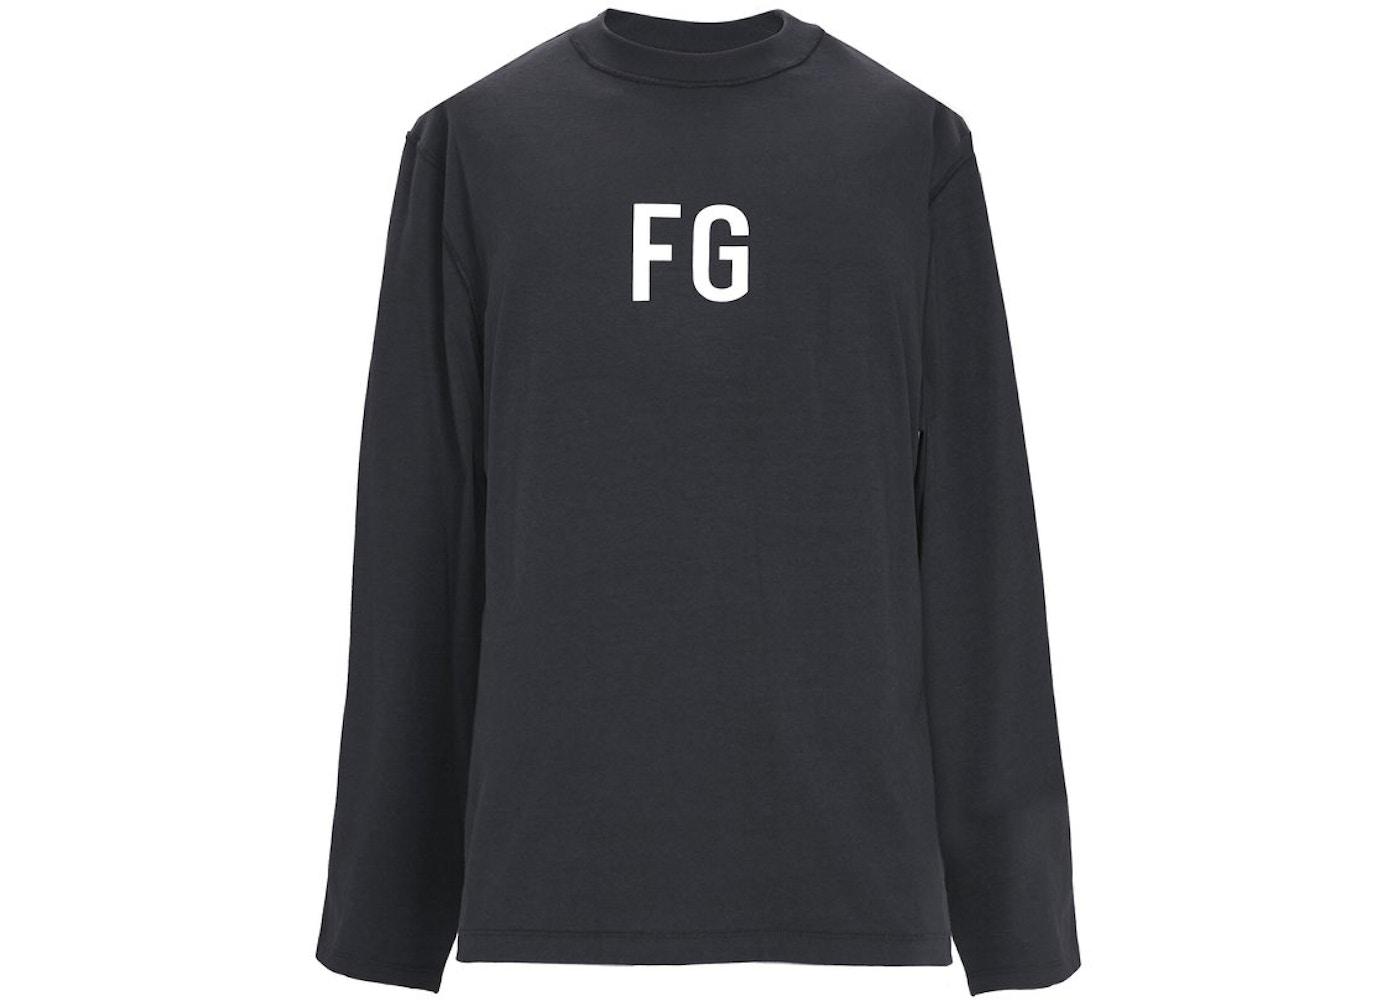 8cbb405e8b49d6 FEAR OF GOD Long Sleeve  FG  T-shirt Vintage Black - Sixth Collection